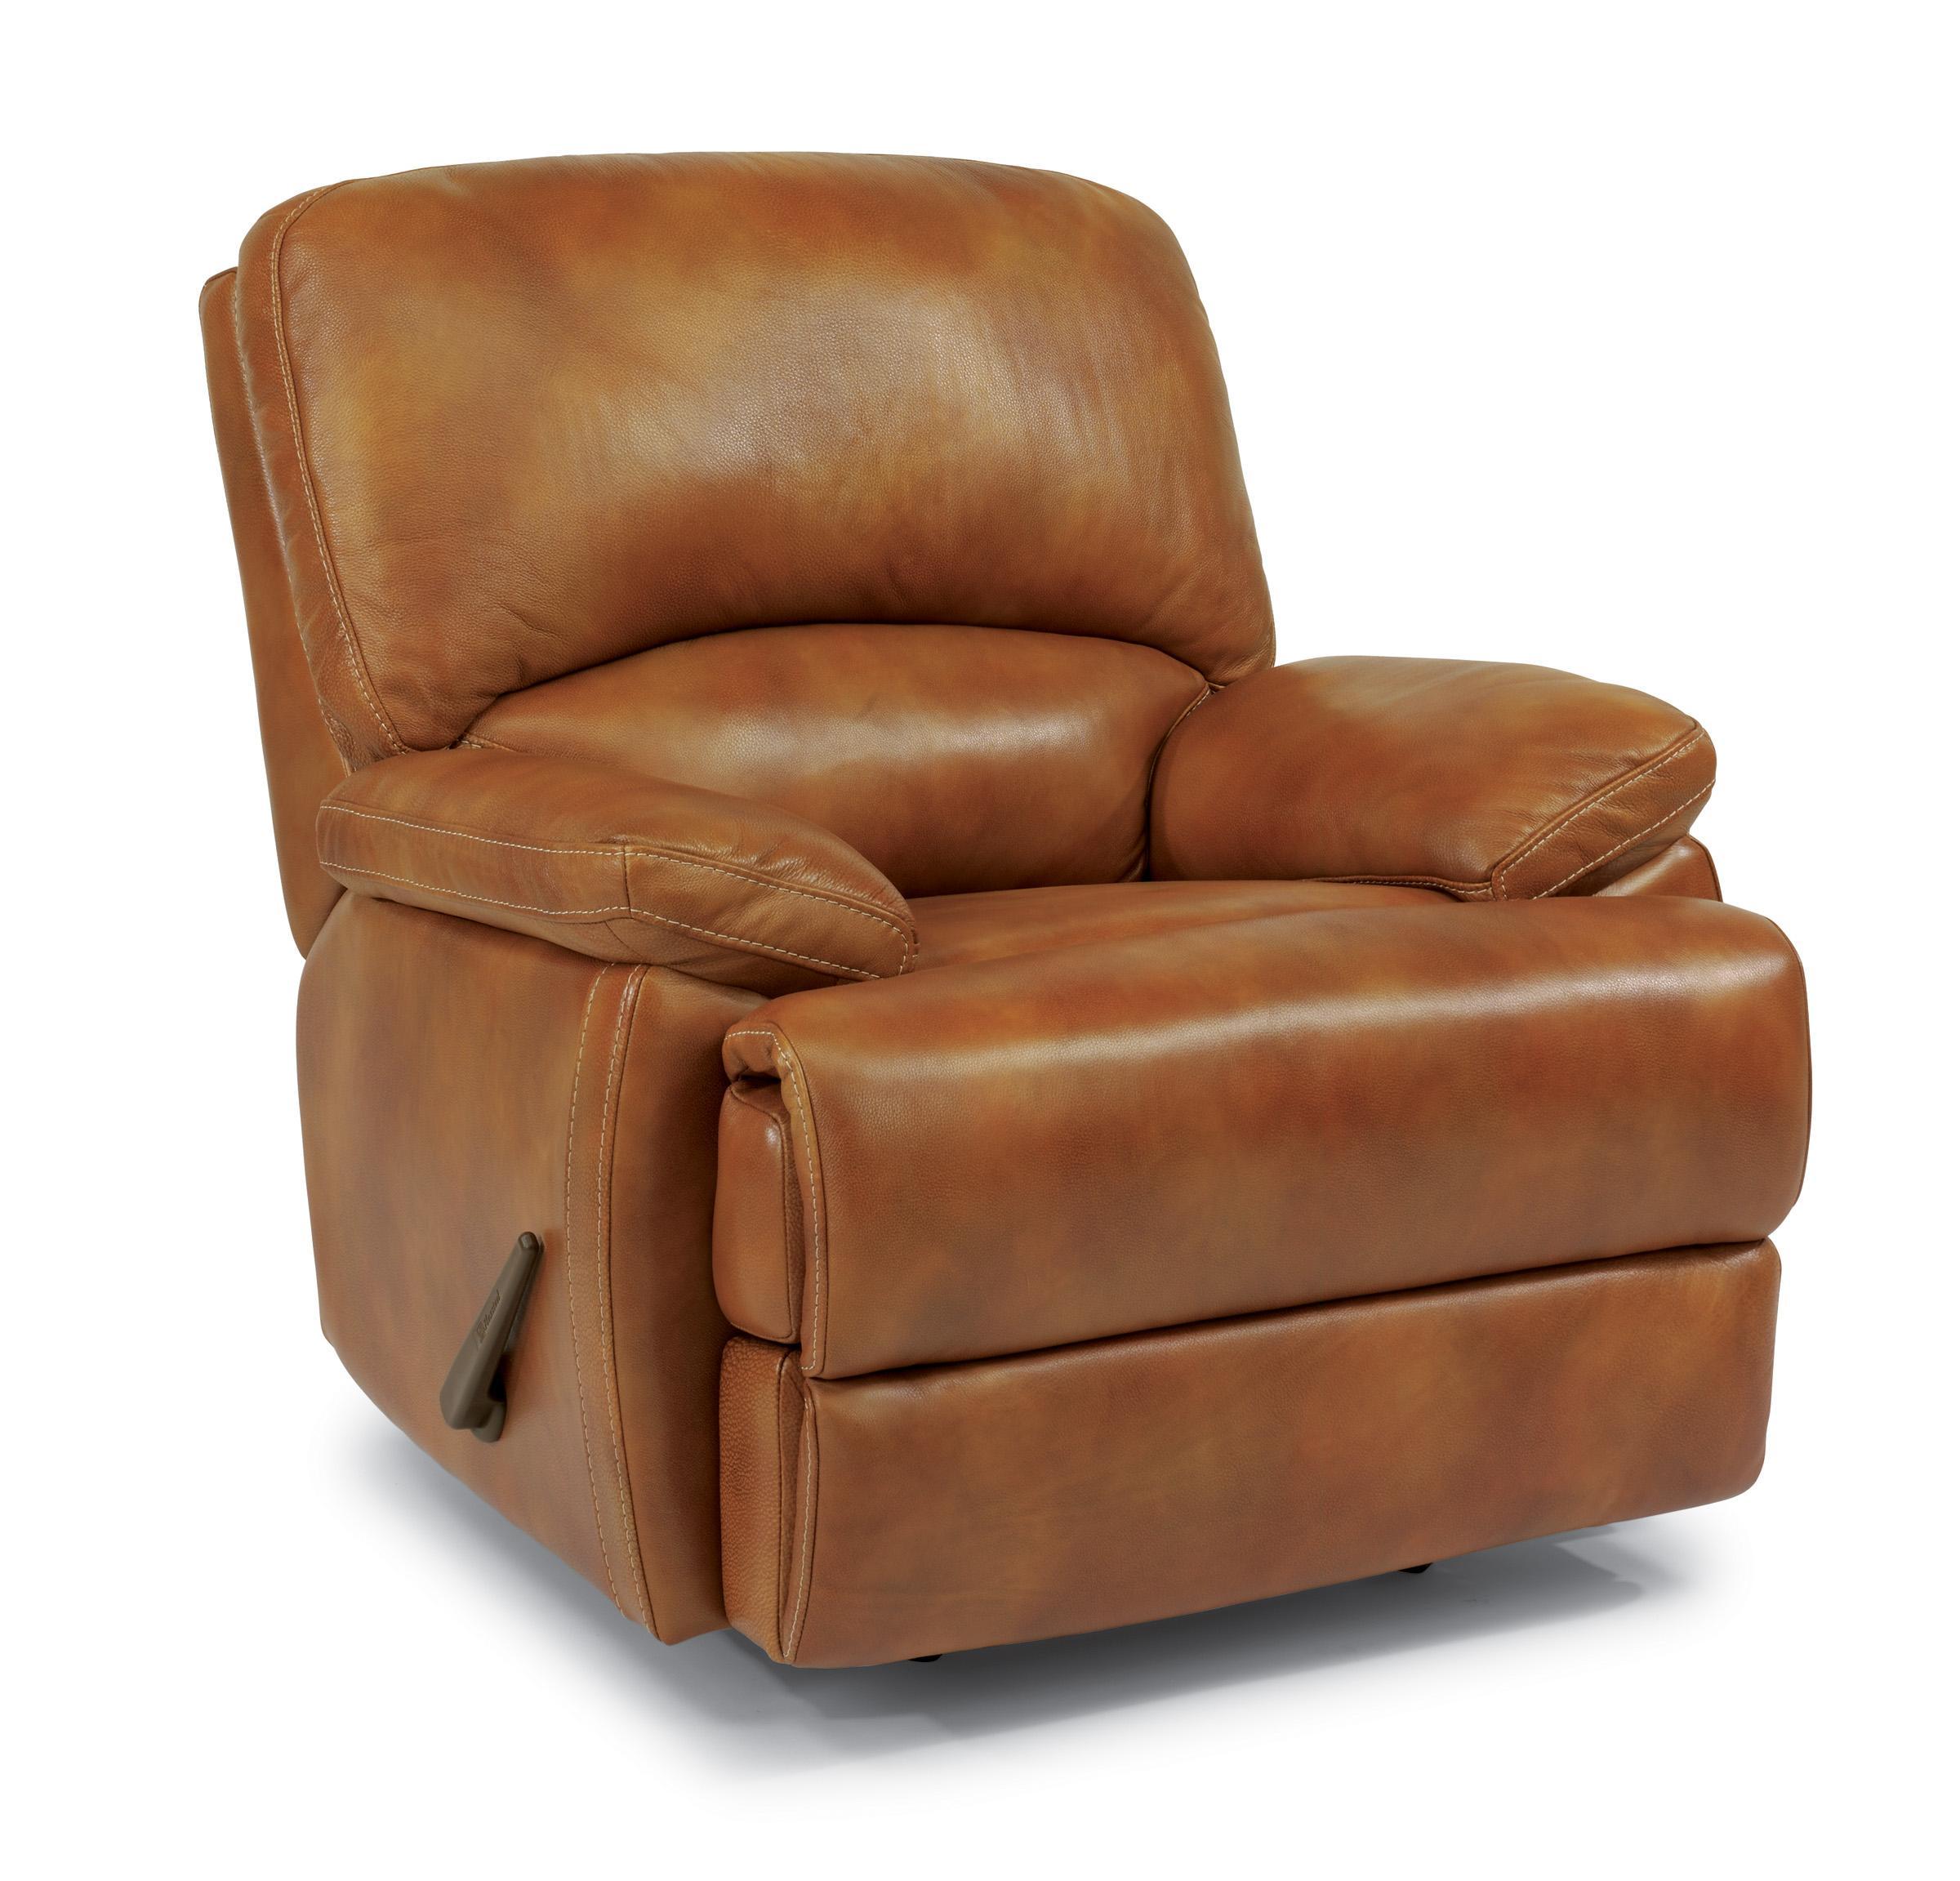 flexsteel latitudes dylan rocker recliner item number